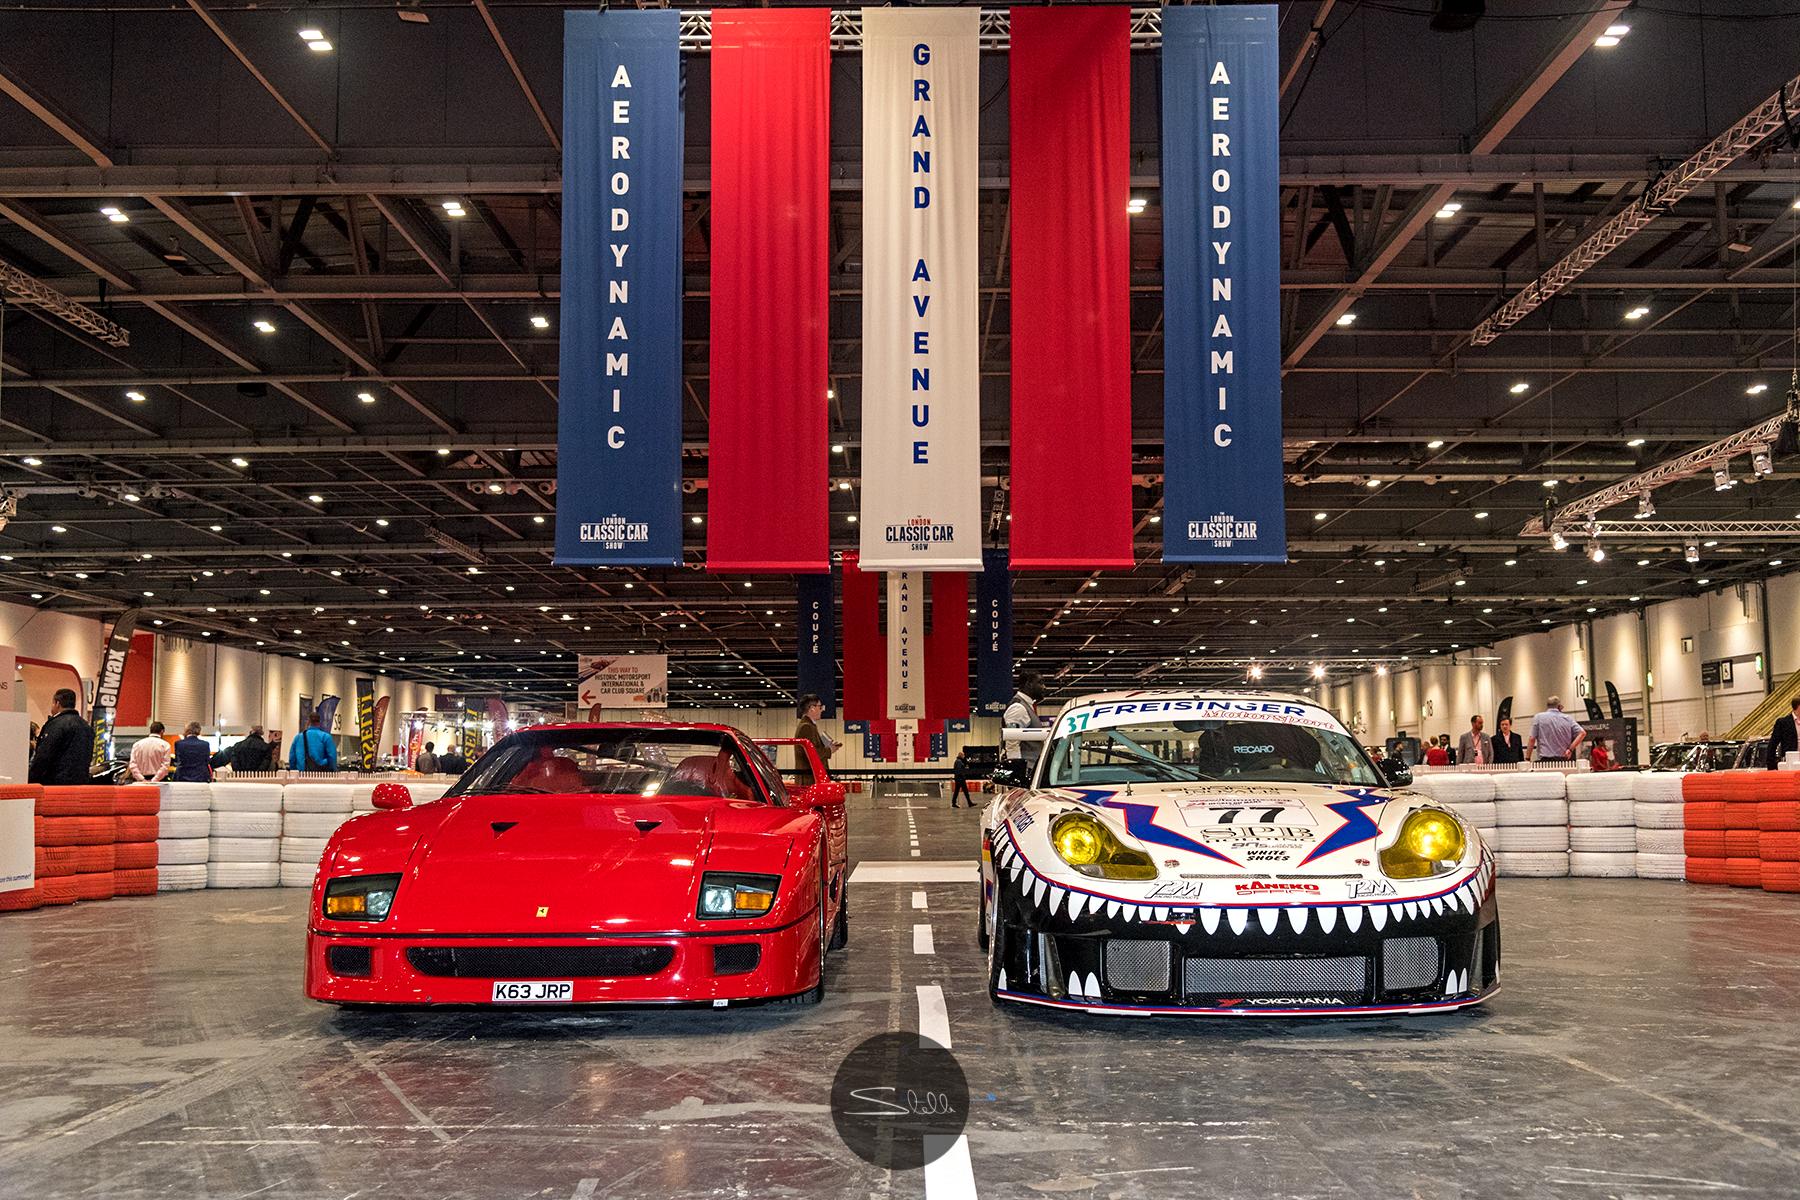 Stella Scordellis London Classic Car Show 2017 41 Watermarked.jpg